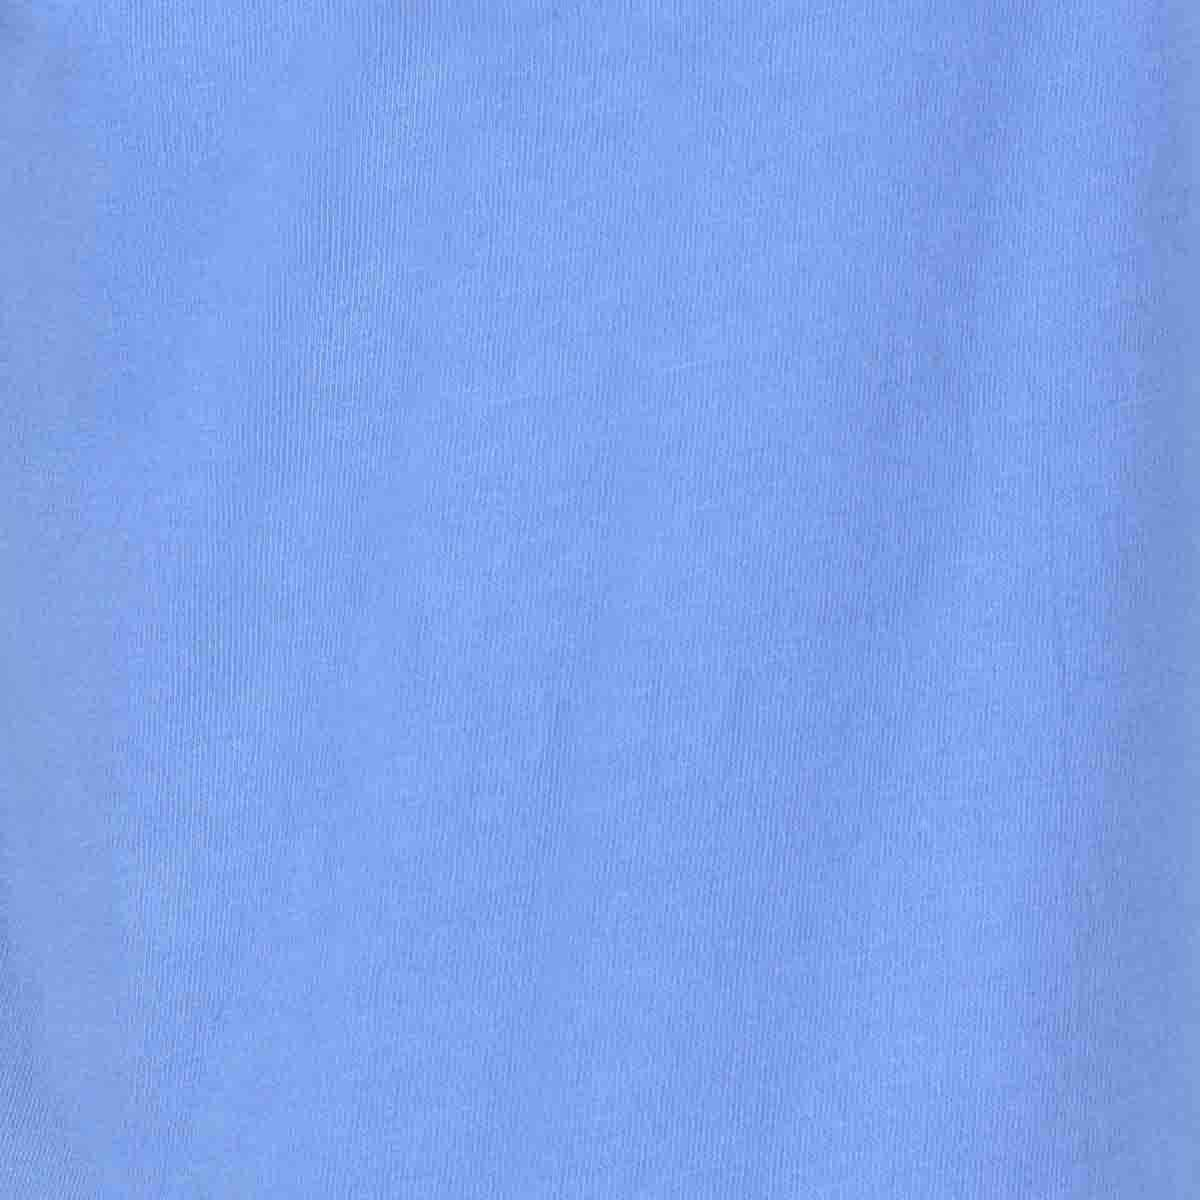 Blusa Manga Corta Estampada Carosello